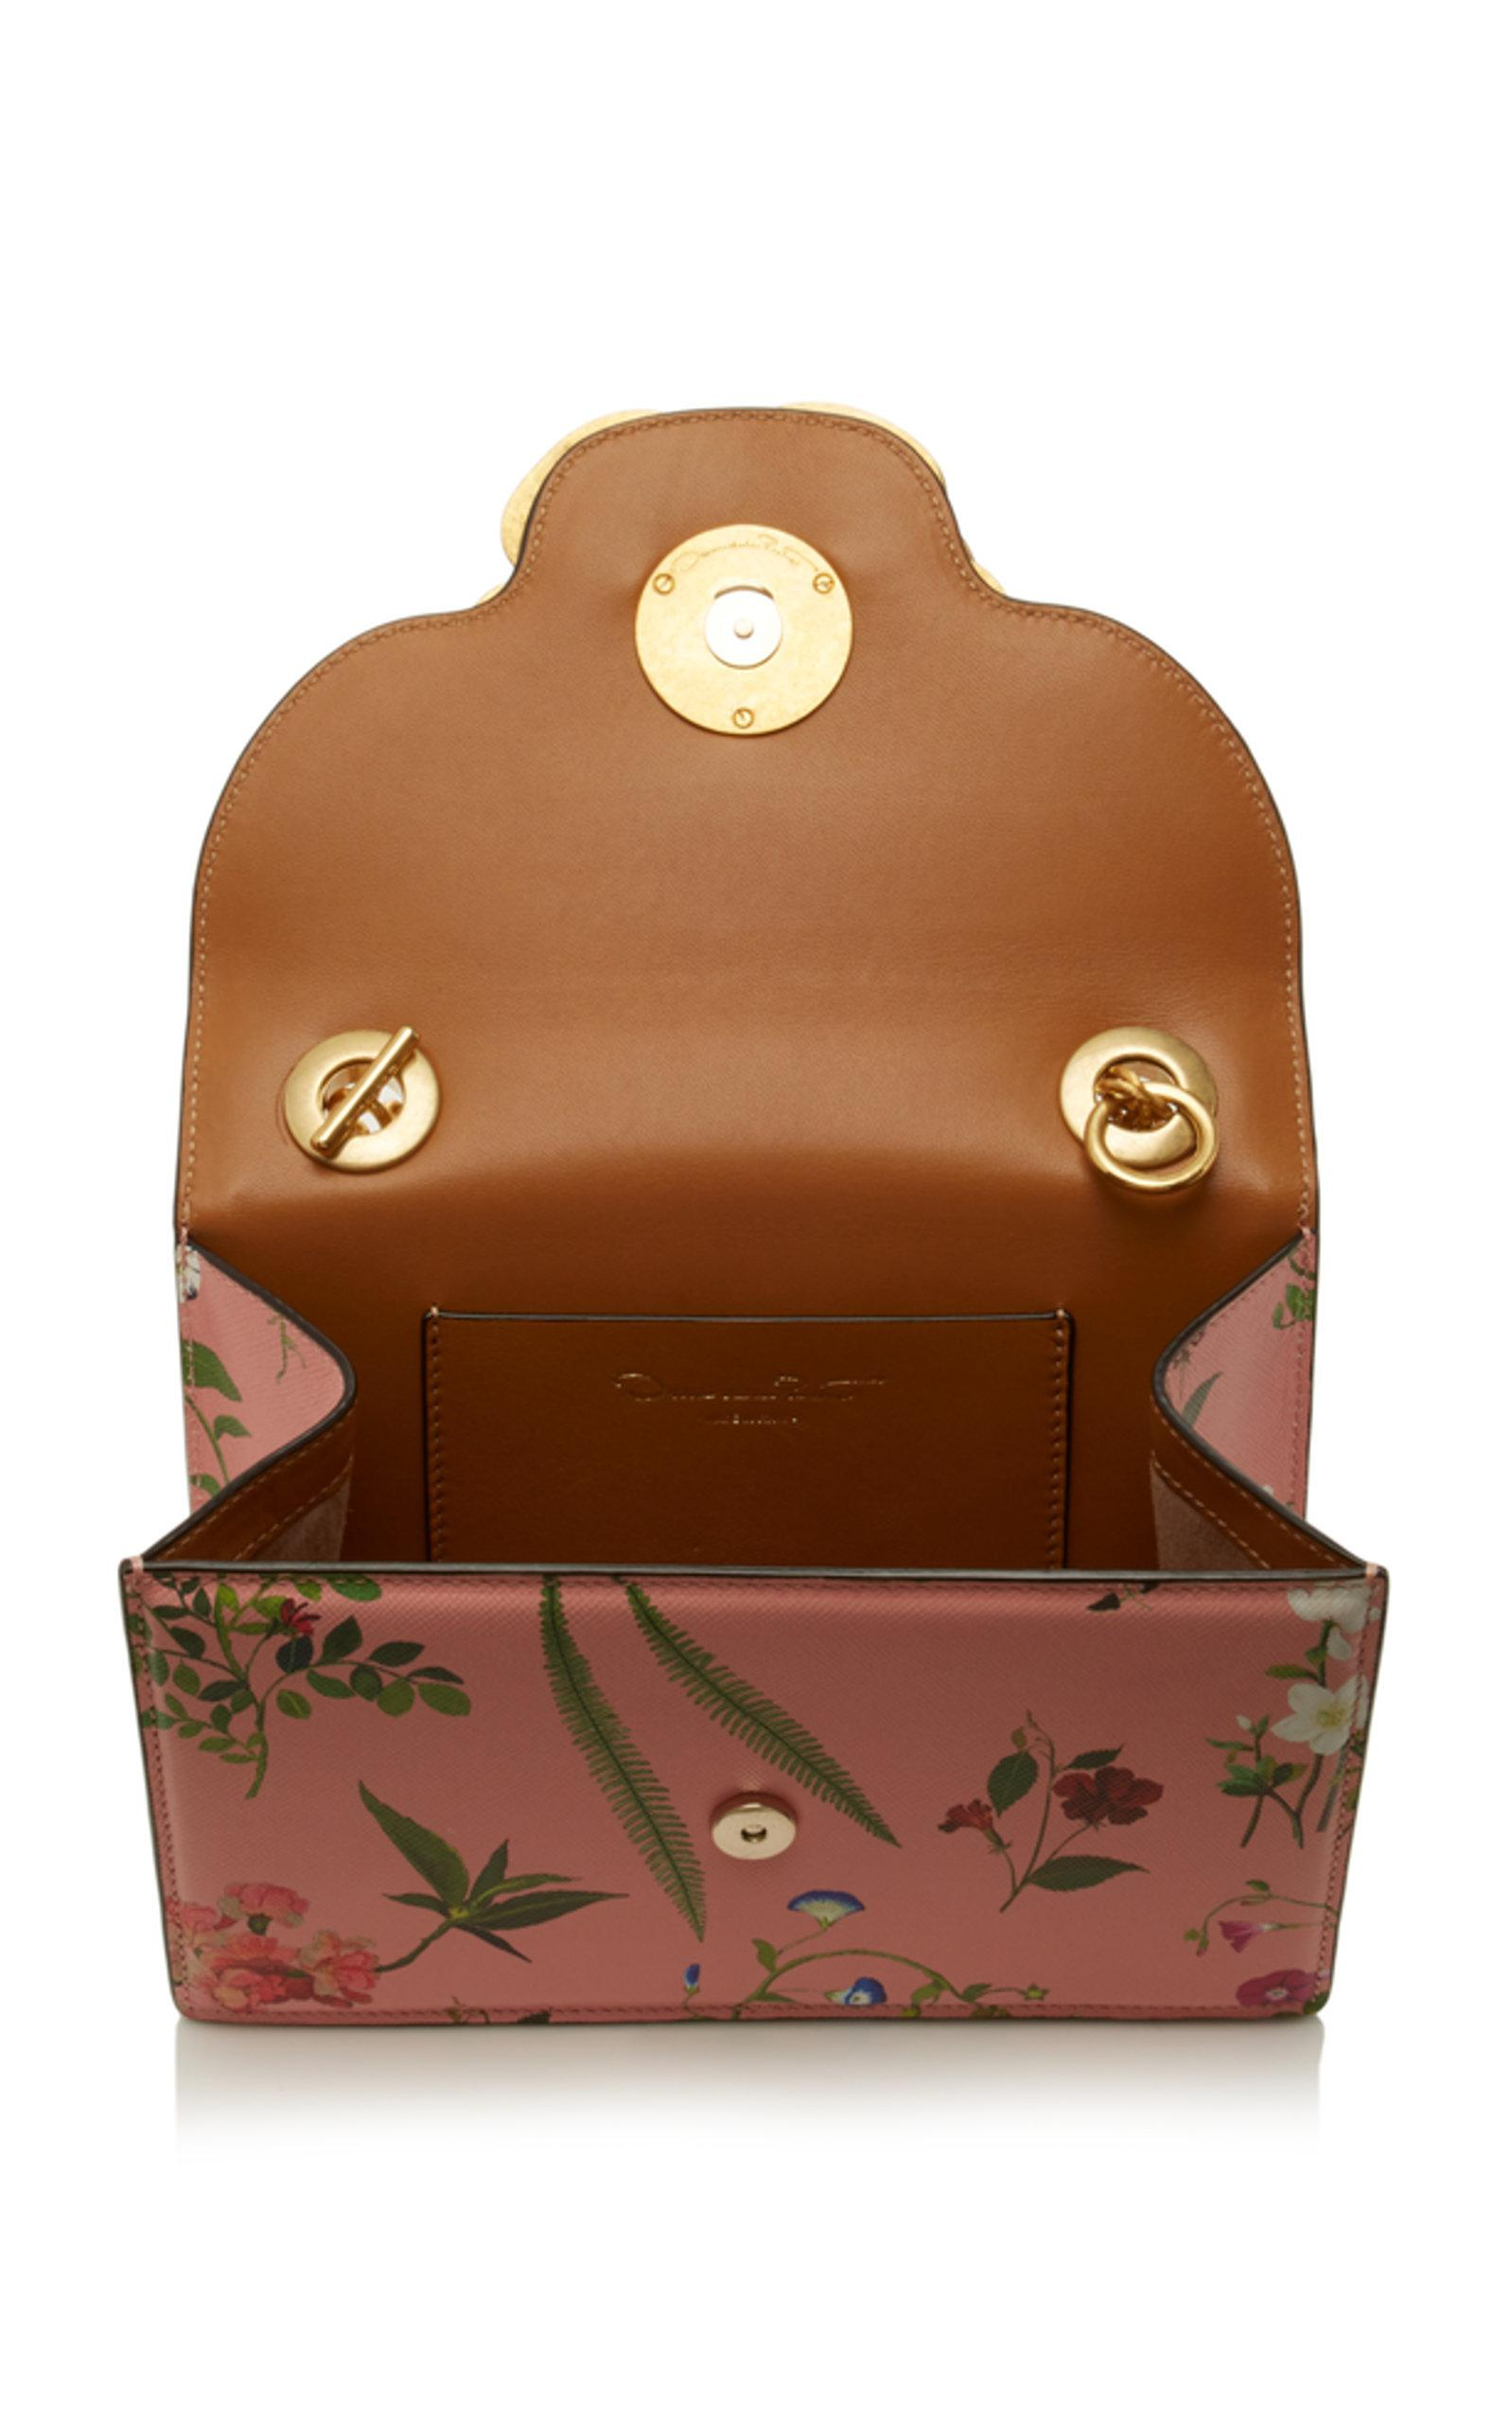 Oscar de la Renta Leather Tro Single Compartment Crossbody Bag